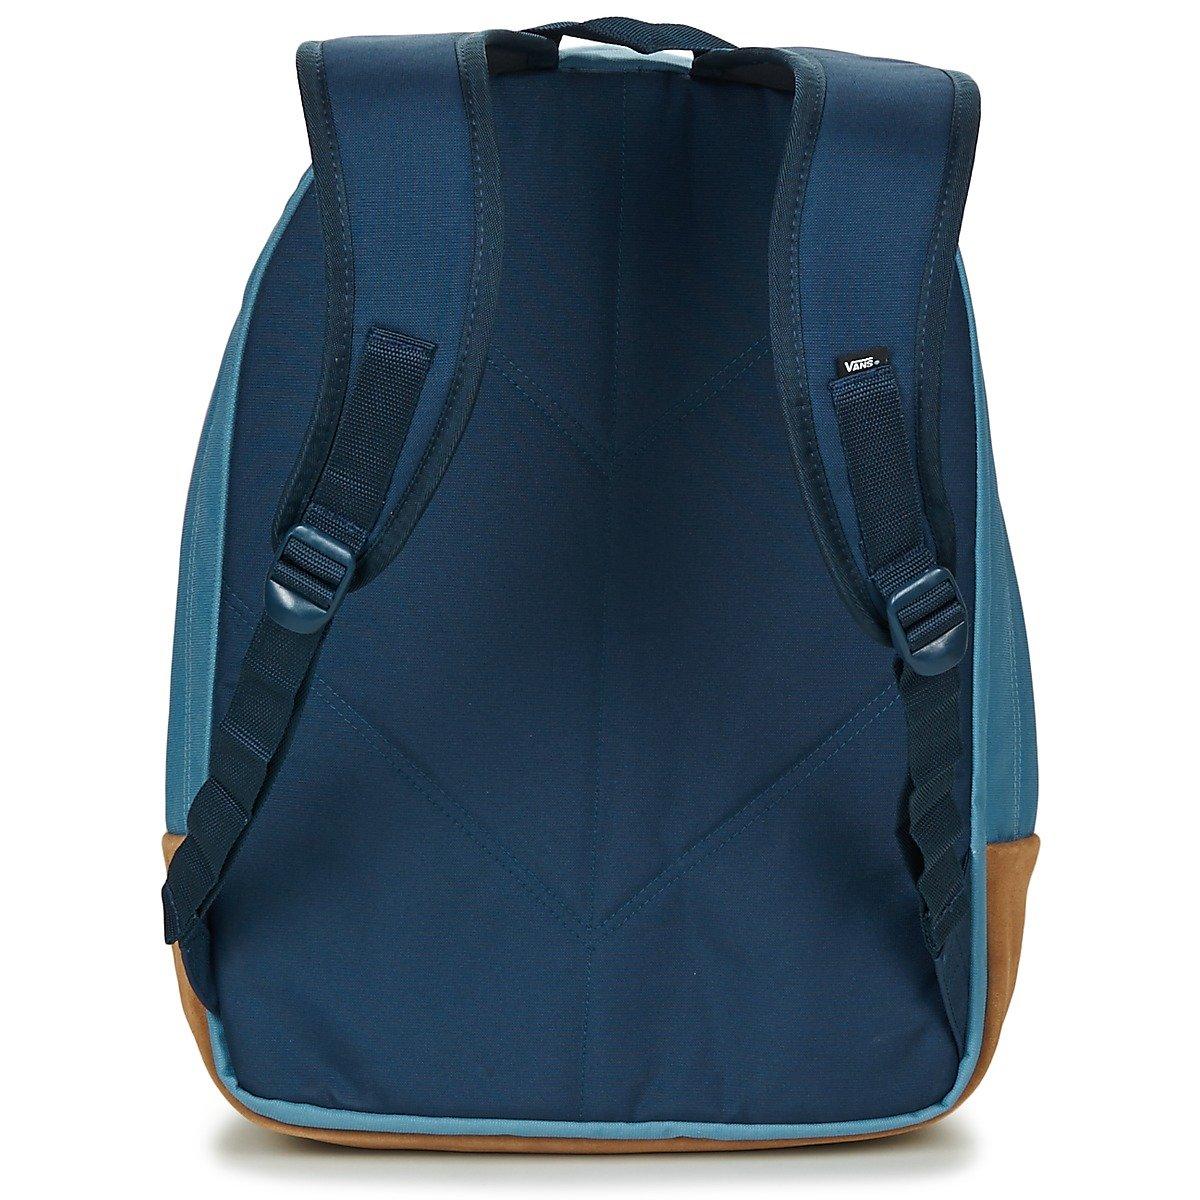 Vans Mochila de a Diario, Copen Blue Dress Blues (Azul) - V002TMPDZ: Amazon.es: Equipaje